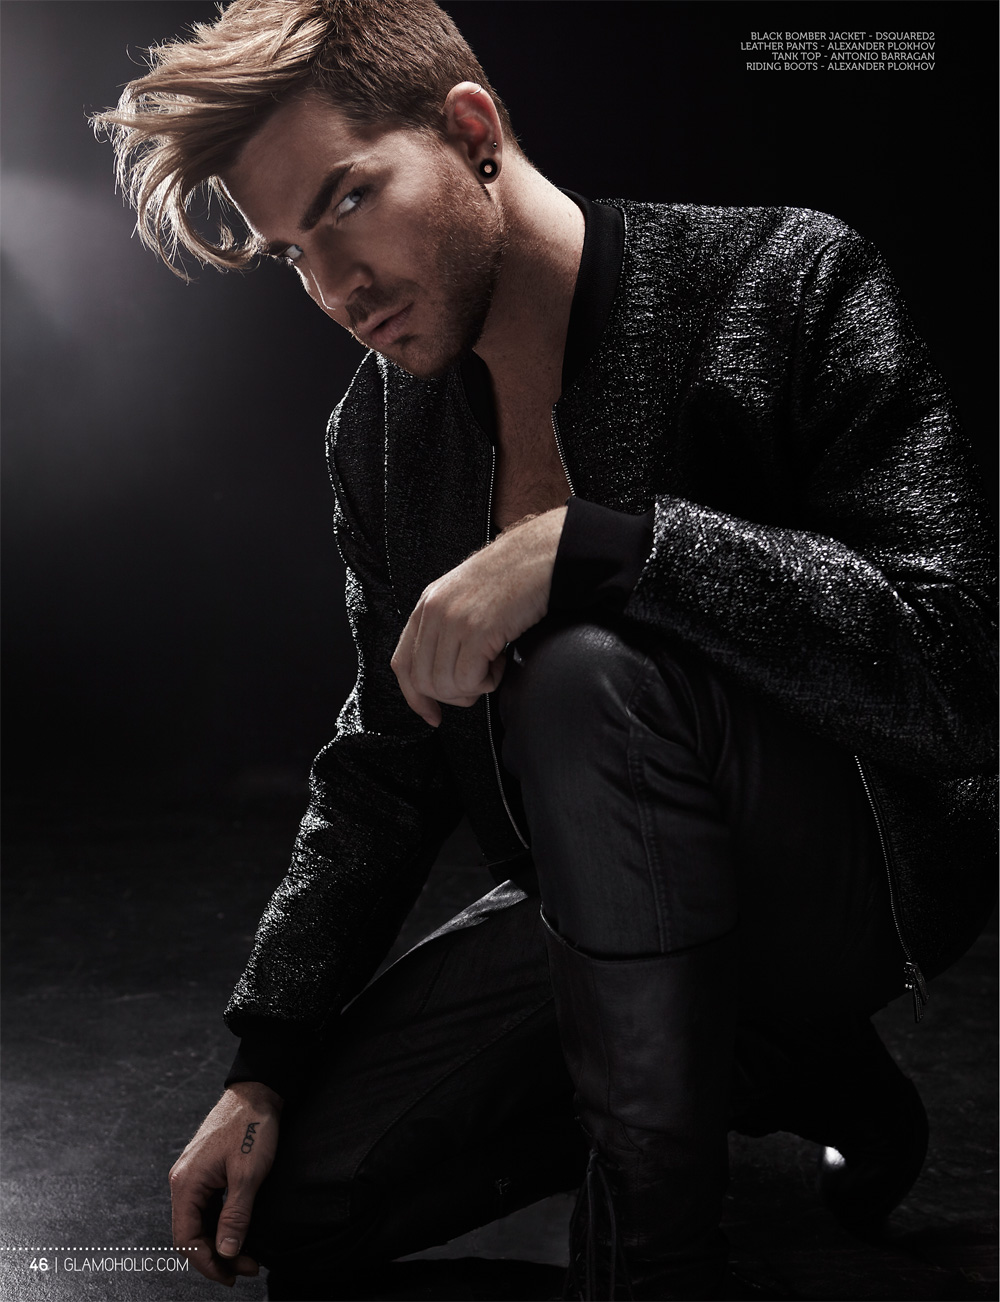 Adam Lambert Sports Dark Fashions for Glamoholic Shoot